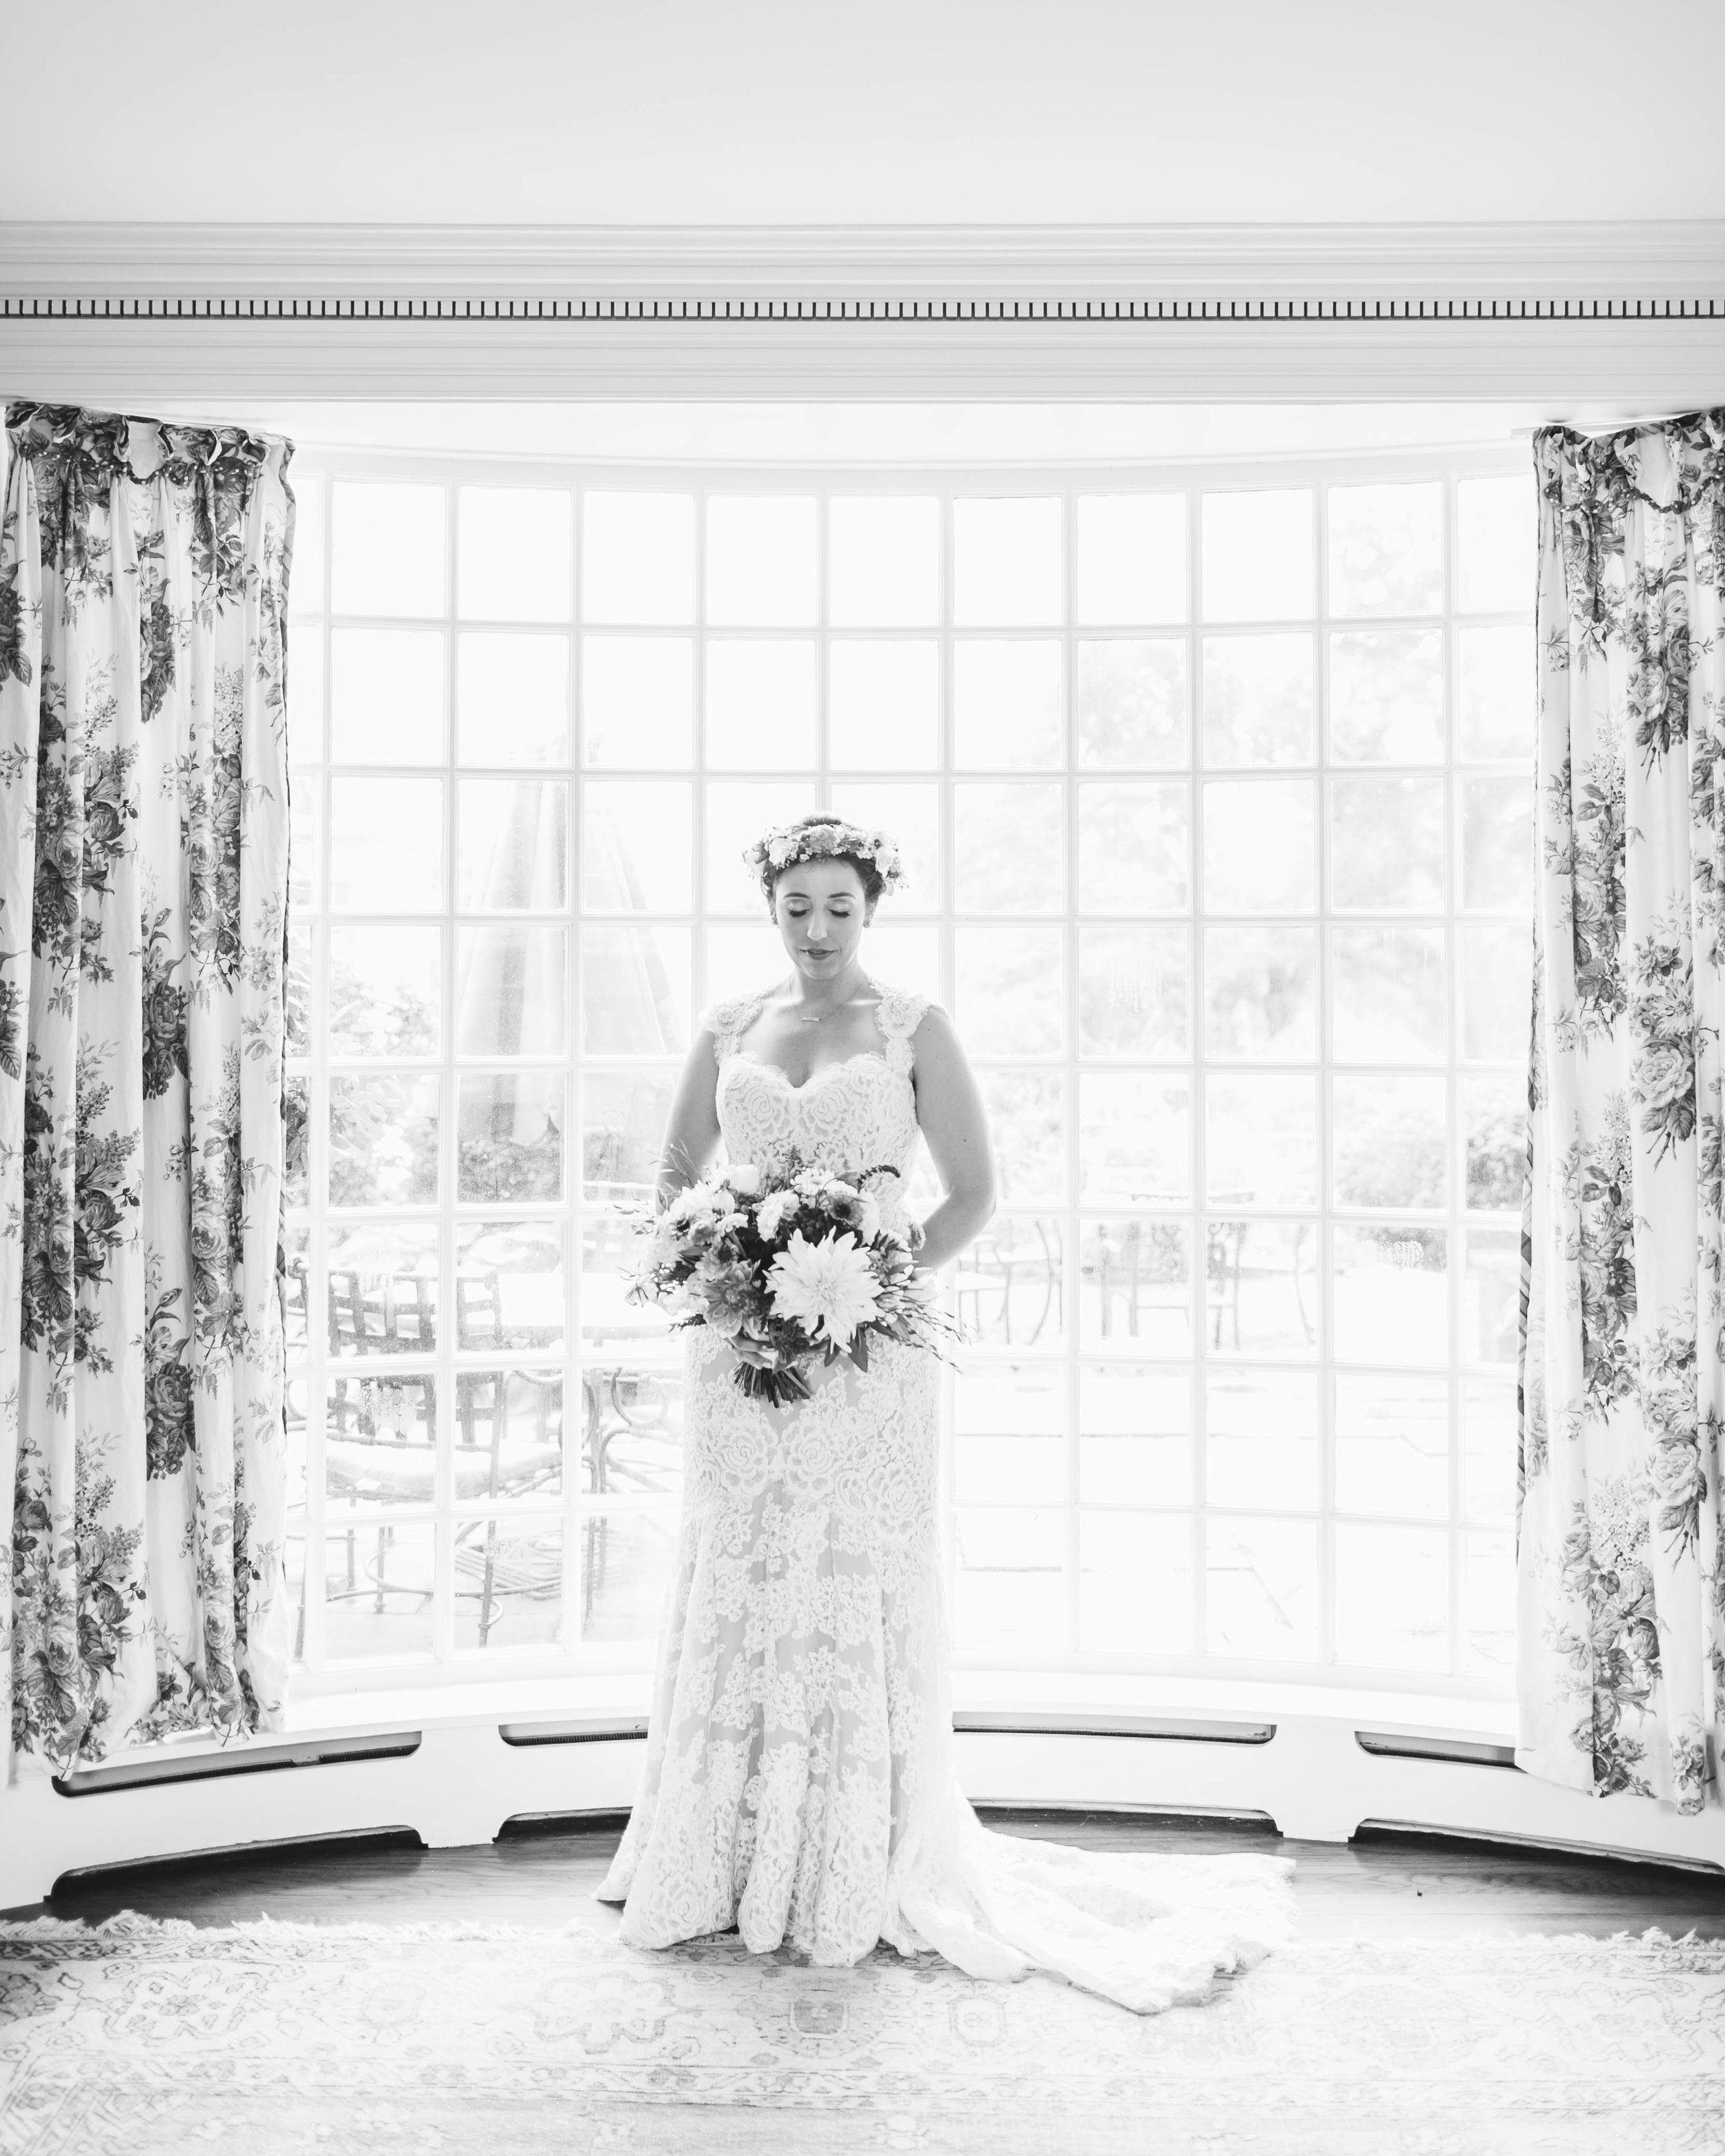 Mount Hope Farm Bristol Rhode Island RI New England Coastal Flower Crown Wedding - Emily Tebbetts Photography-3.jpg